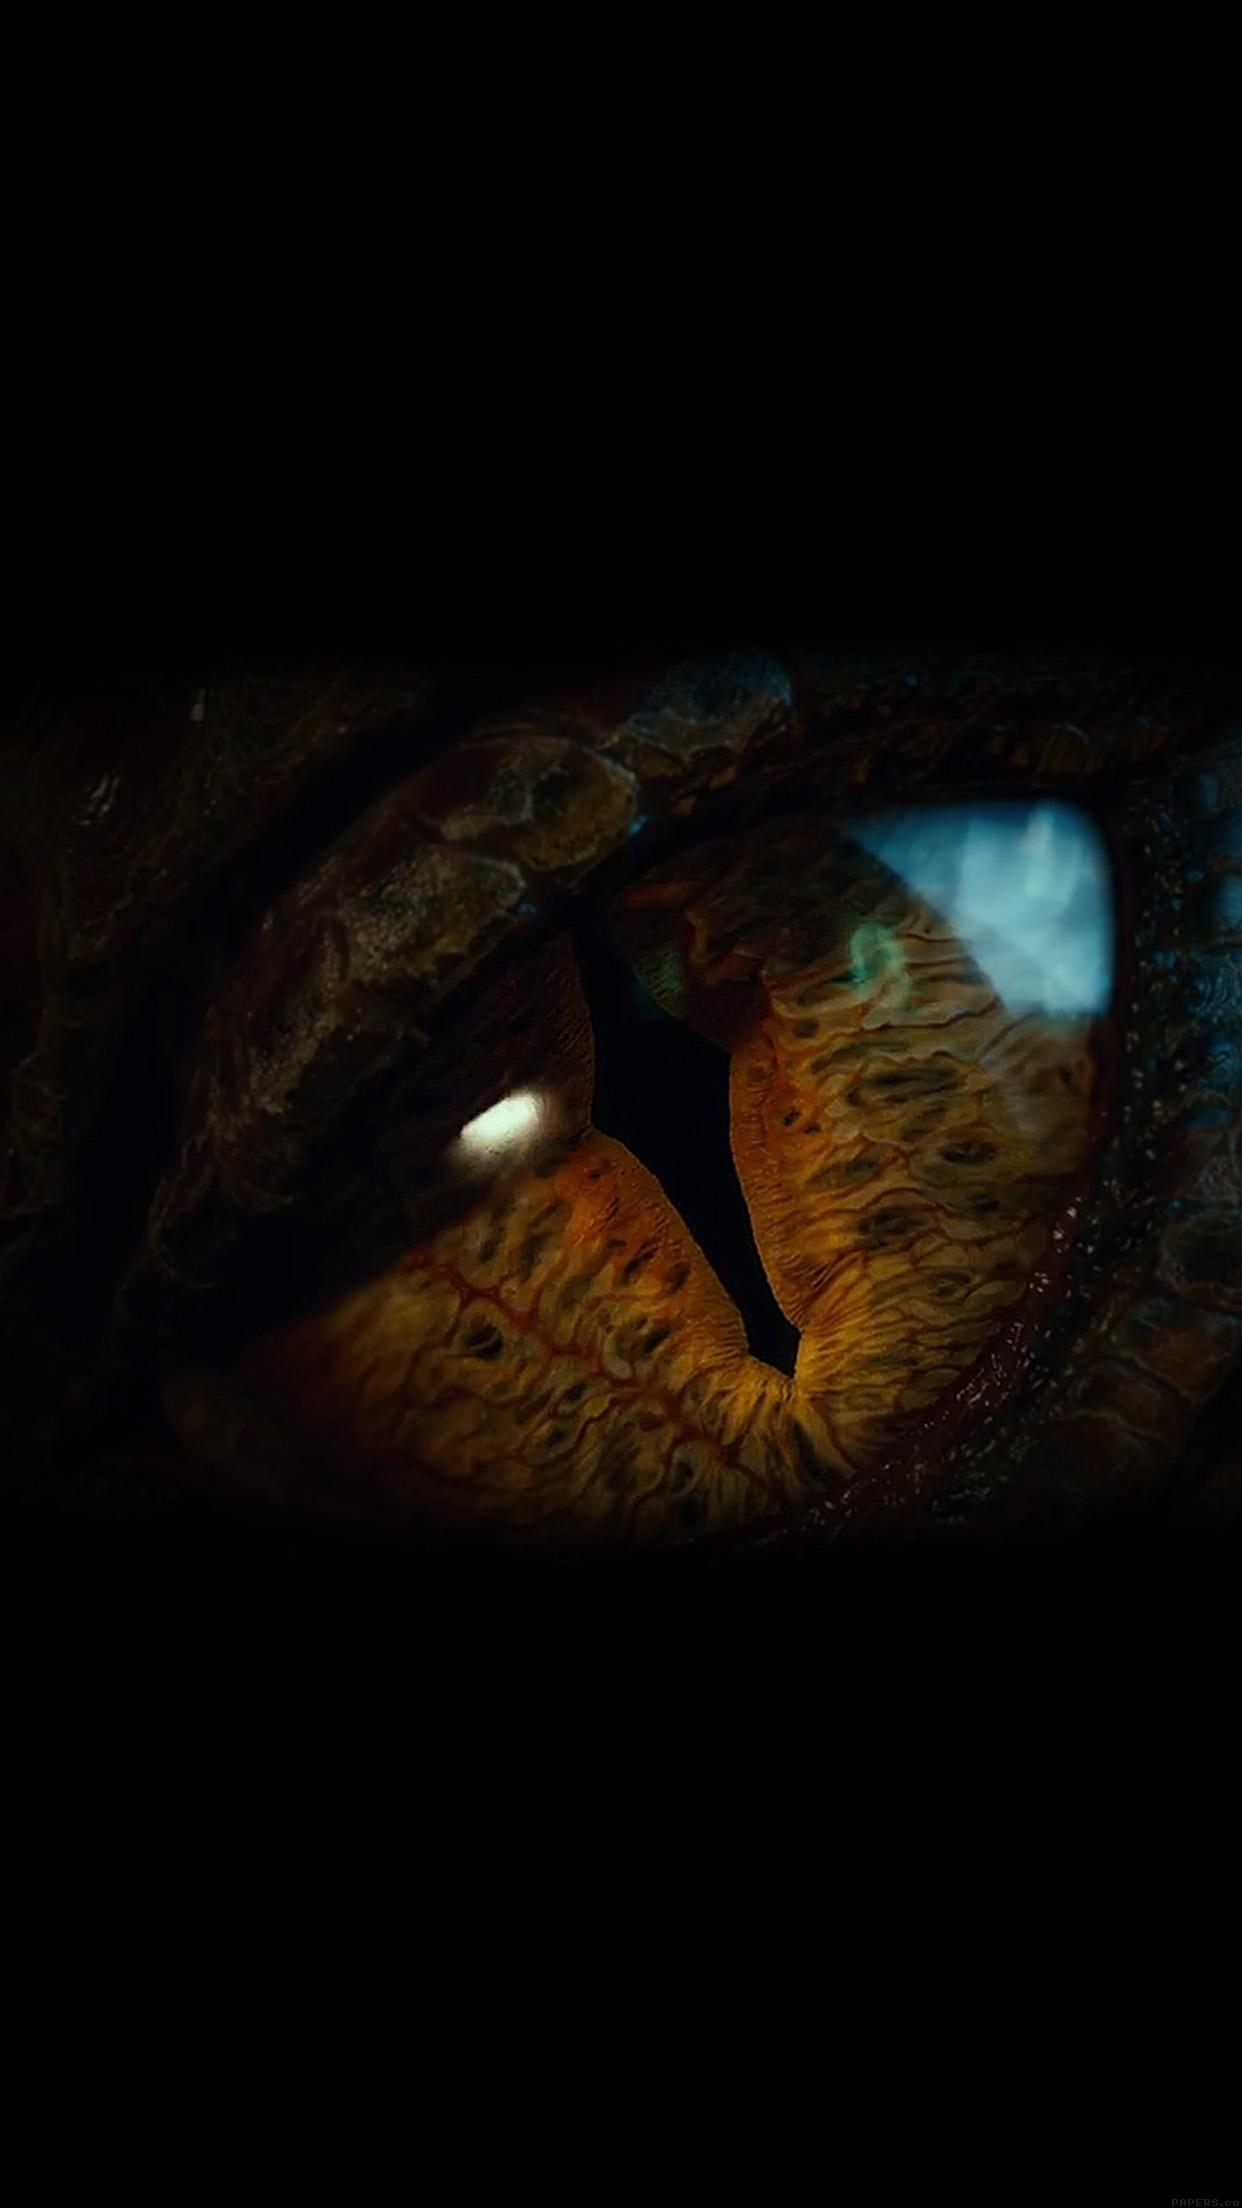 Iphone6papers Ah32 Eye Dragon Hobbit The Battle Five